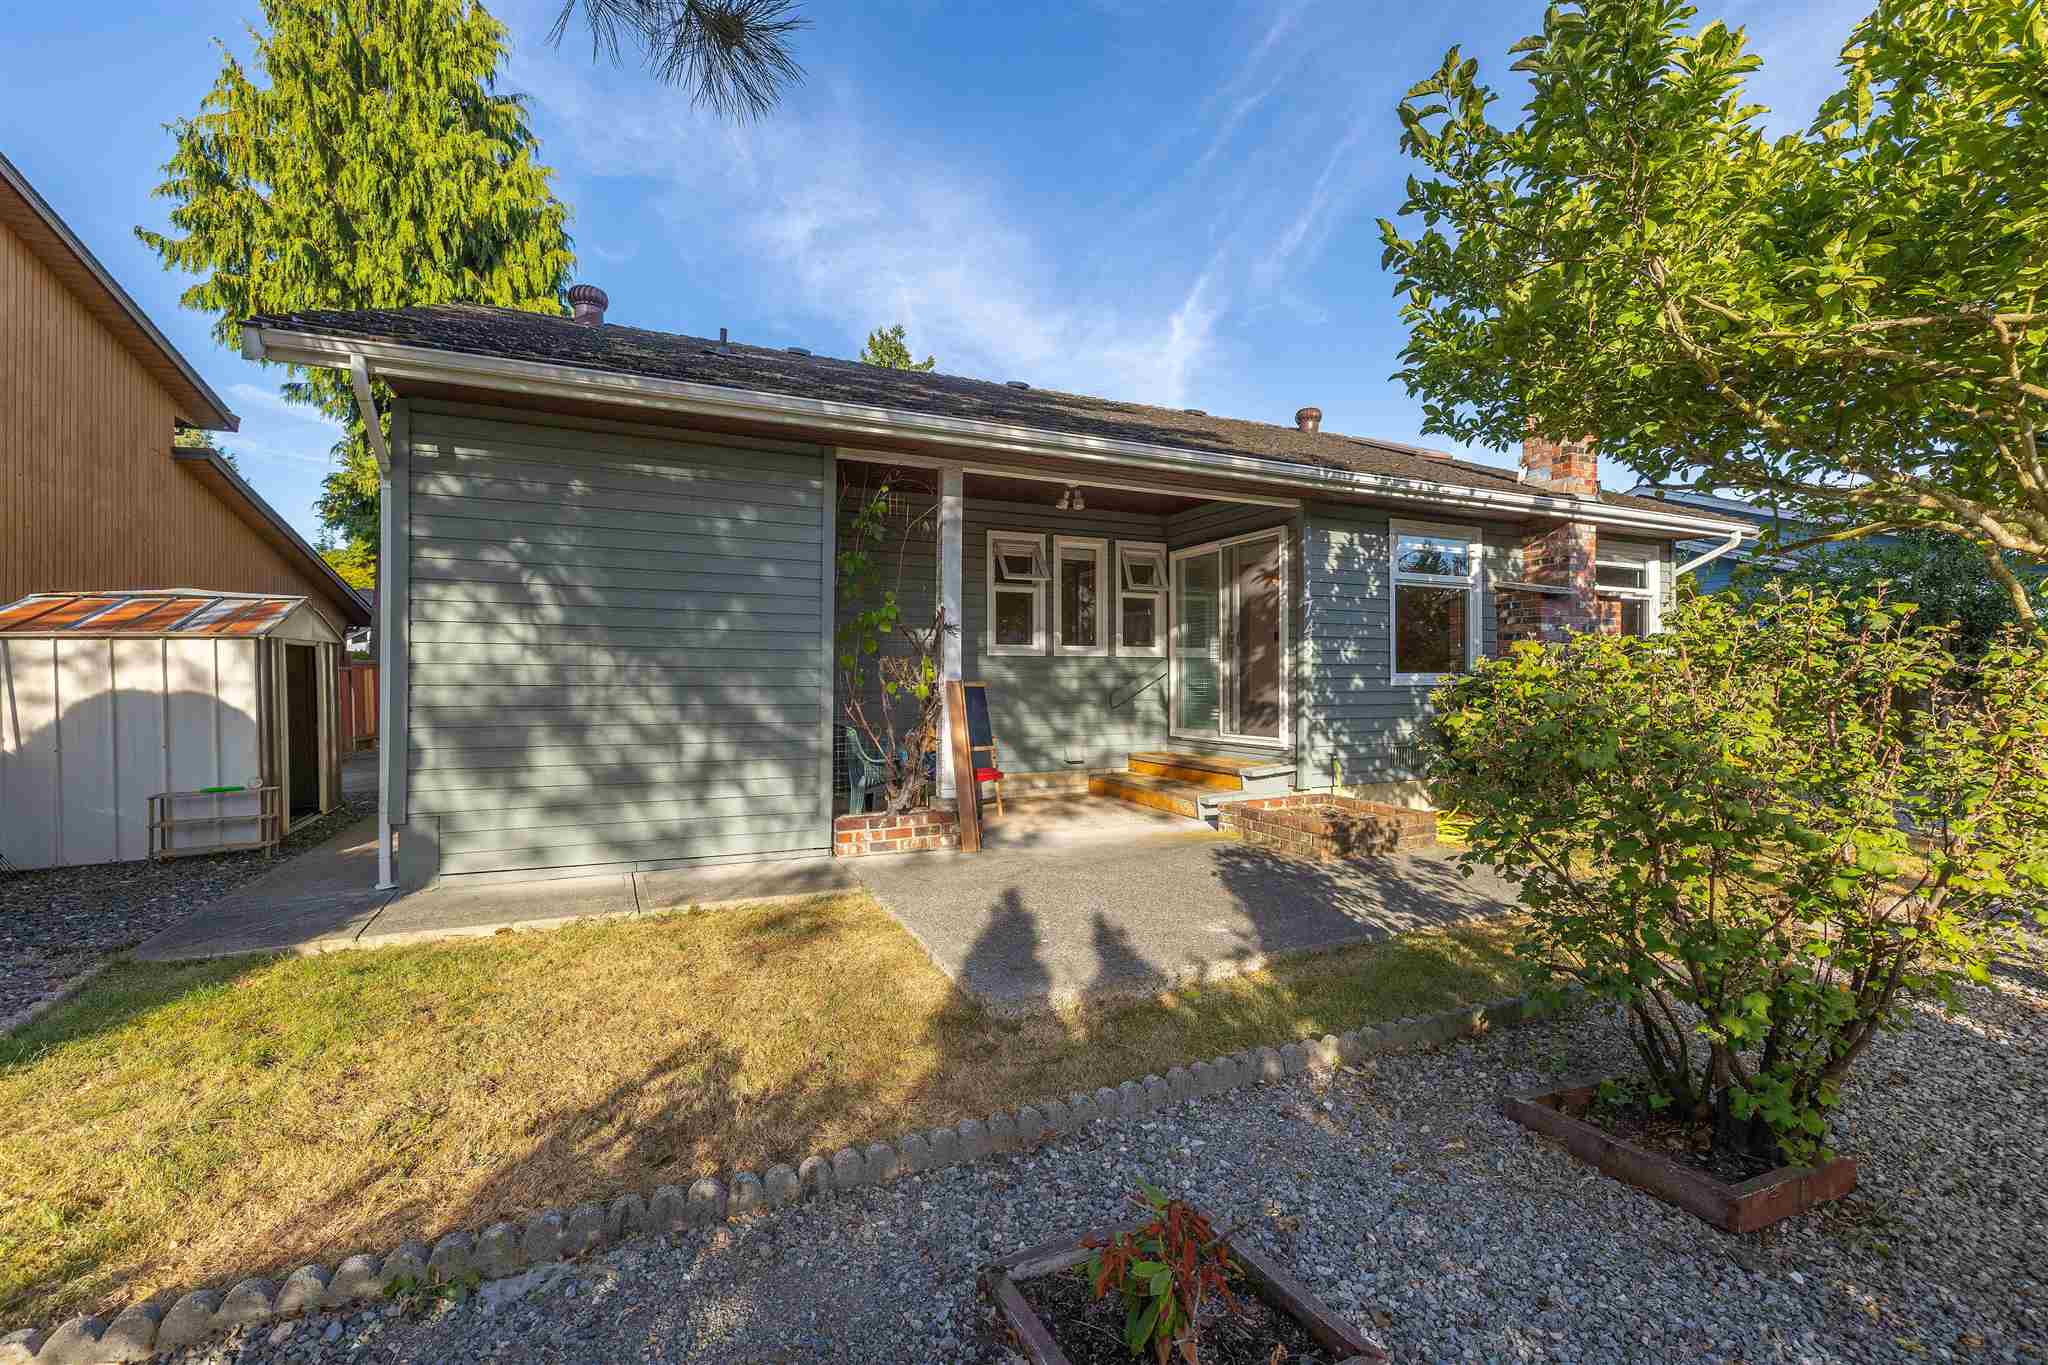 1743 148A STREET - Sunnyside Park Surrey House/Single Family for sale, 3 Bedrooms (R2604804) - #20